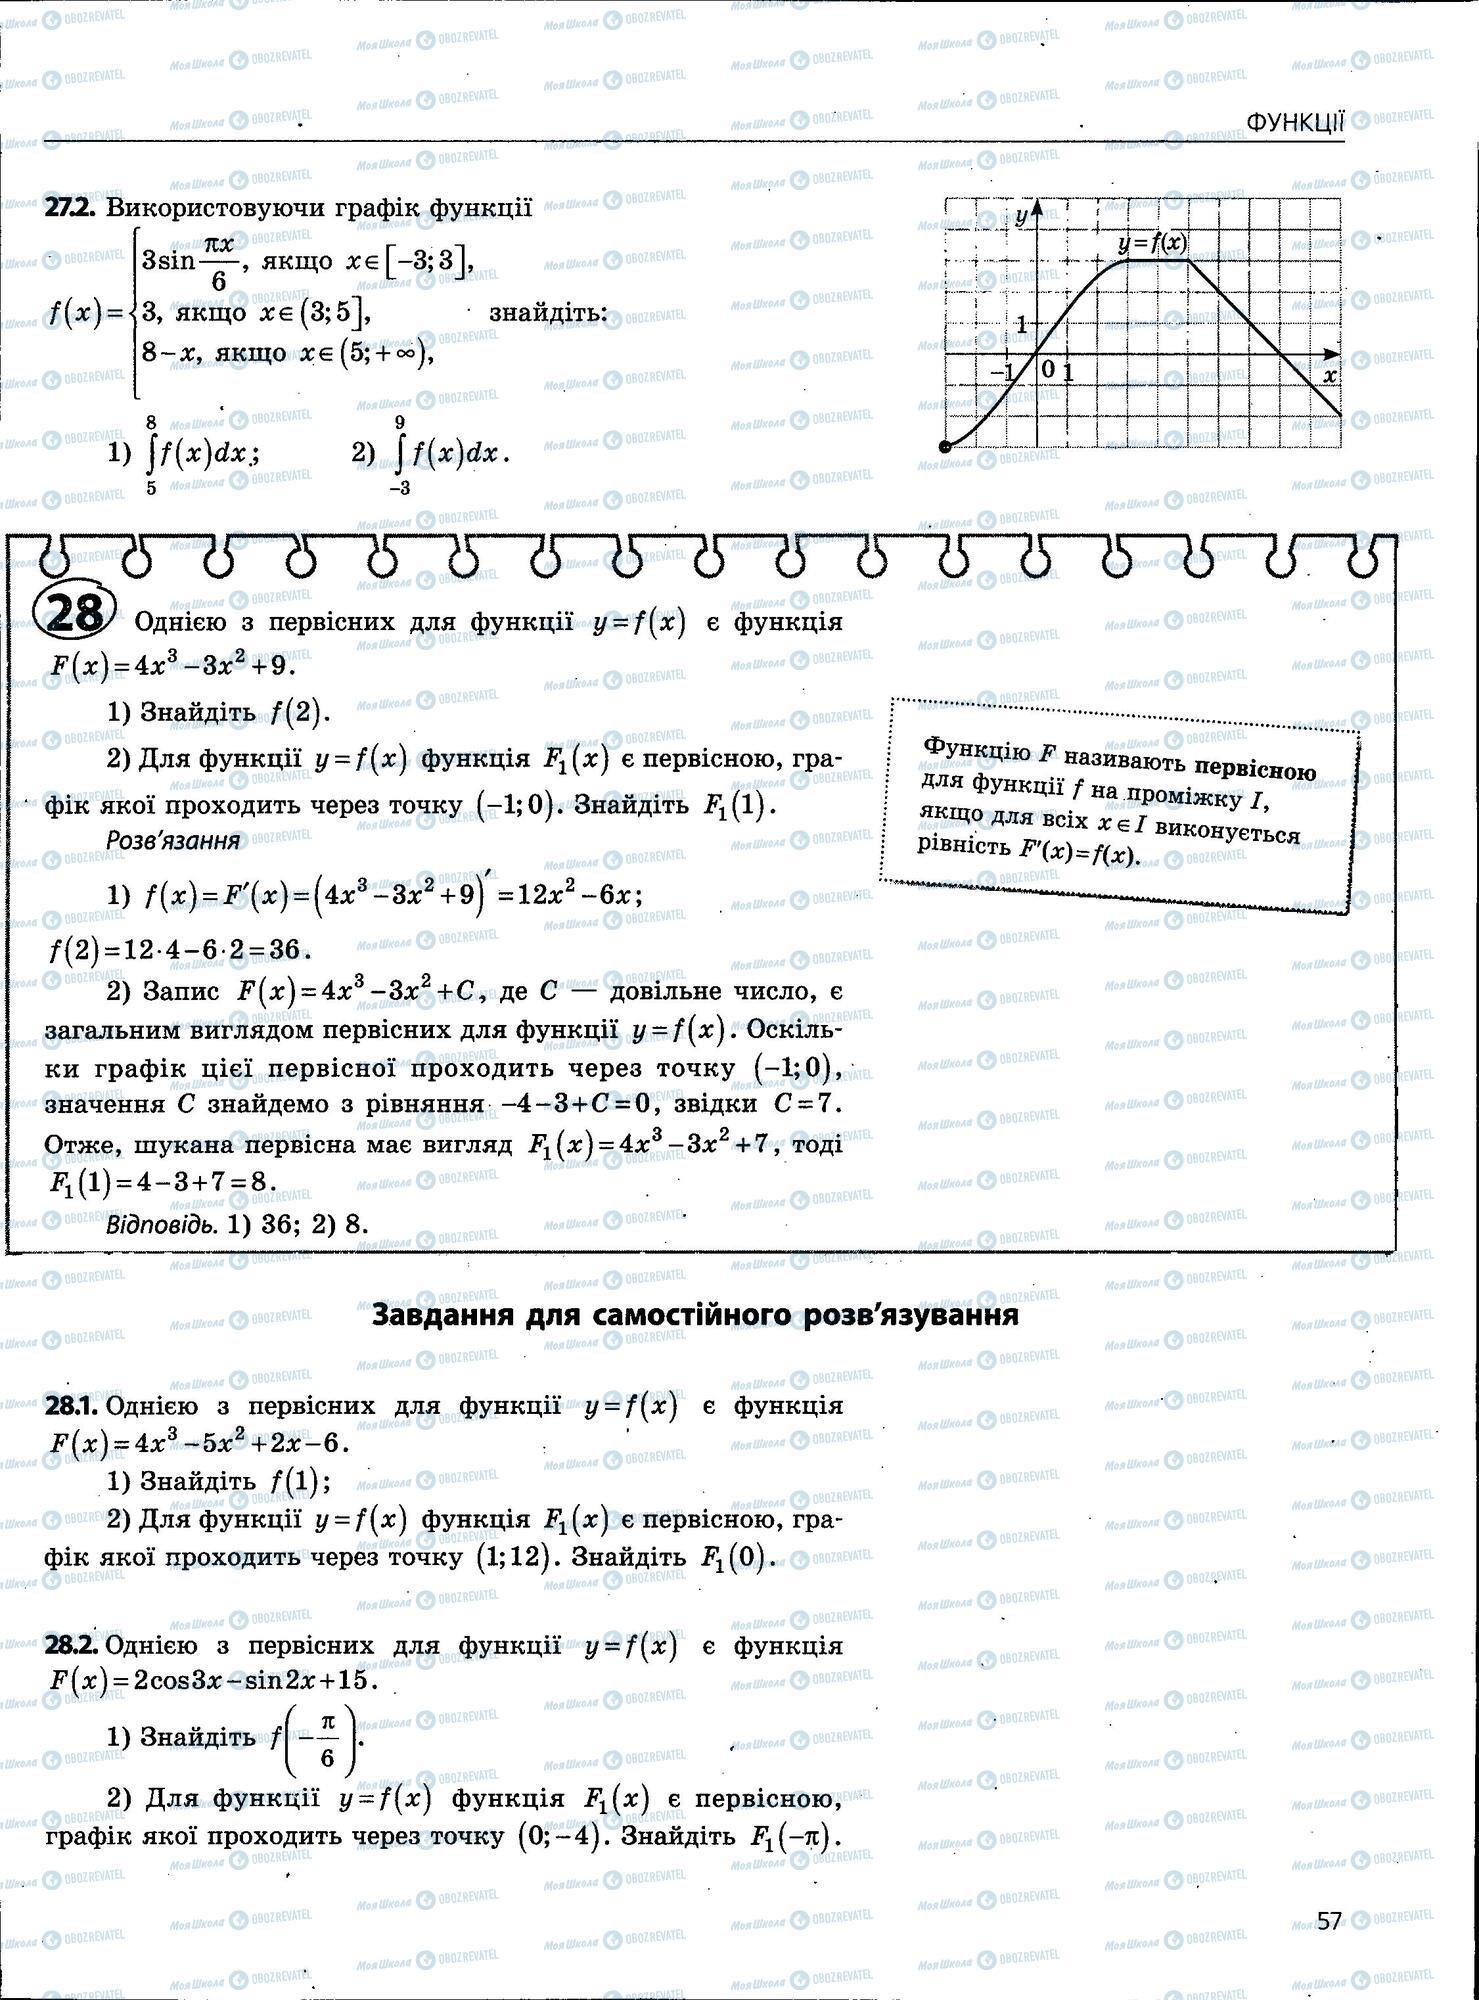 ЗНО Математика 11 класс страница 57